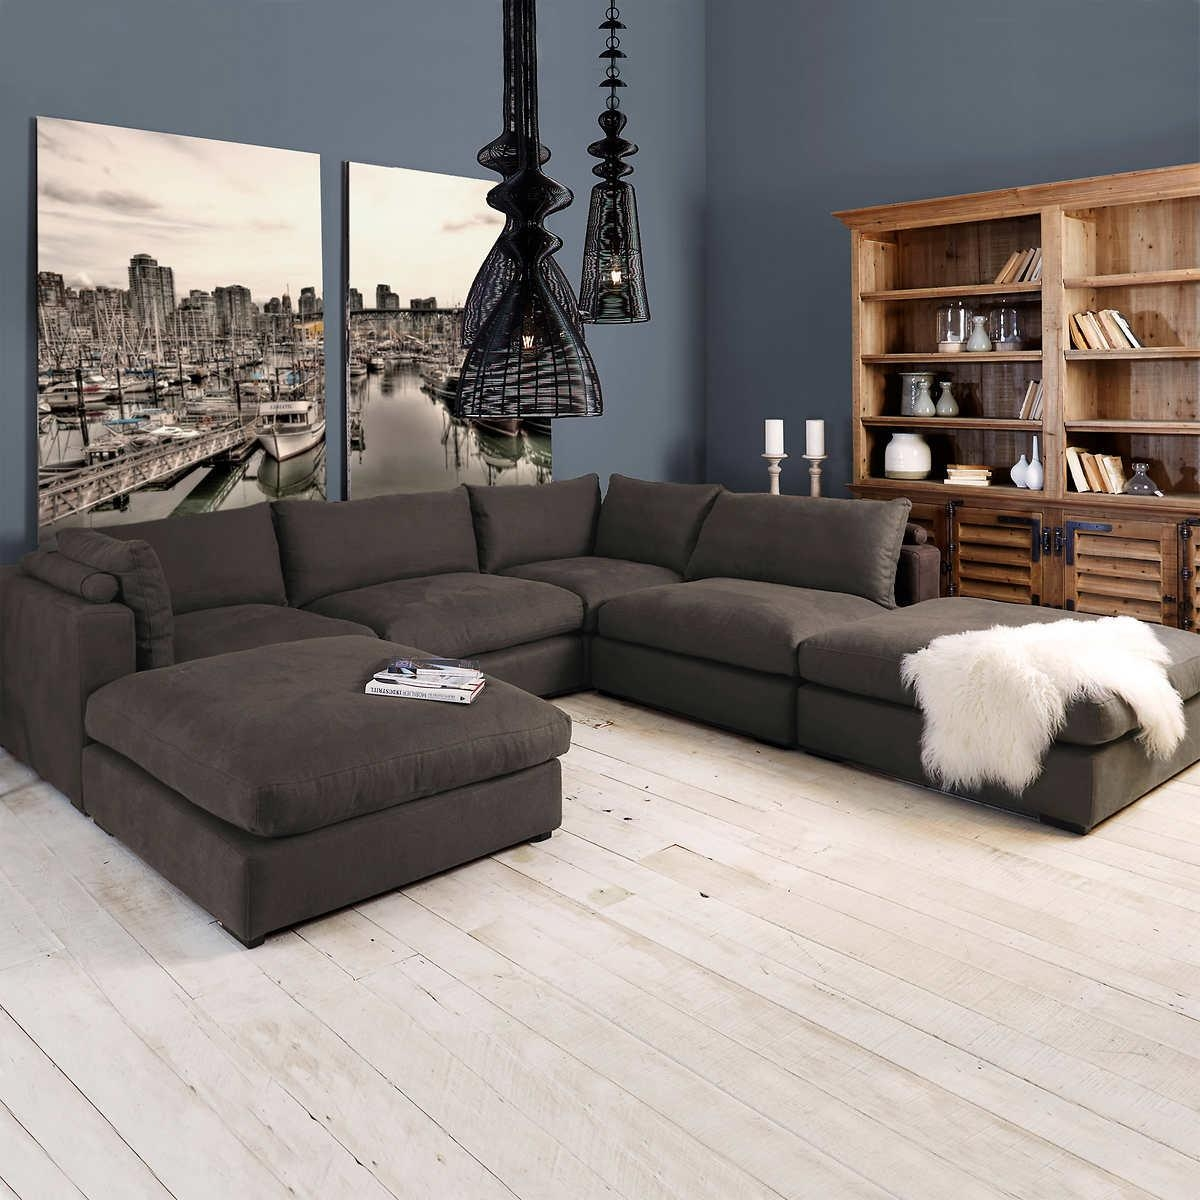 Sofas Center : Modular Sectional Sofa Leather1 900X700 Free Inside Leather Modular Sectional Sofas (View 7 of 20)